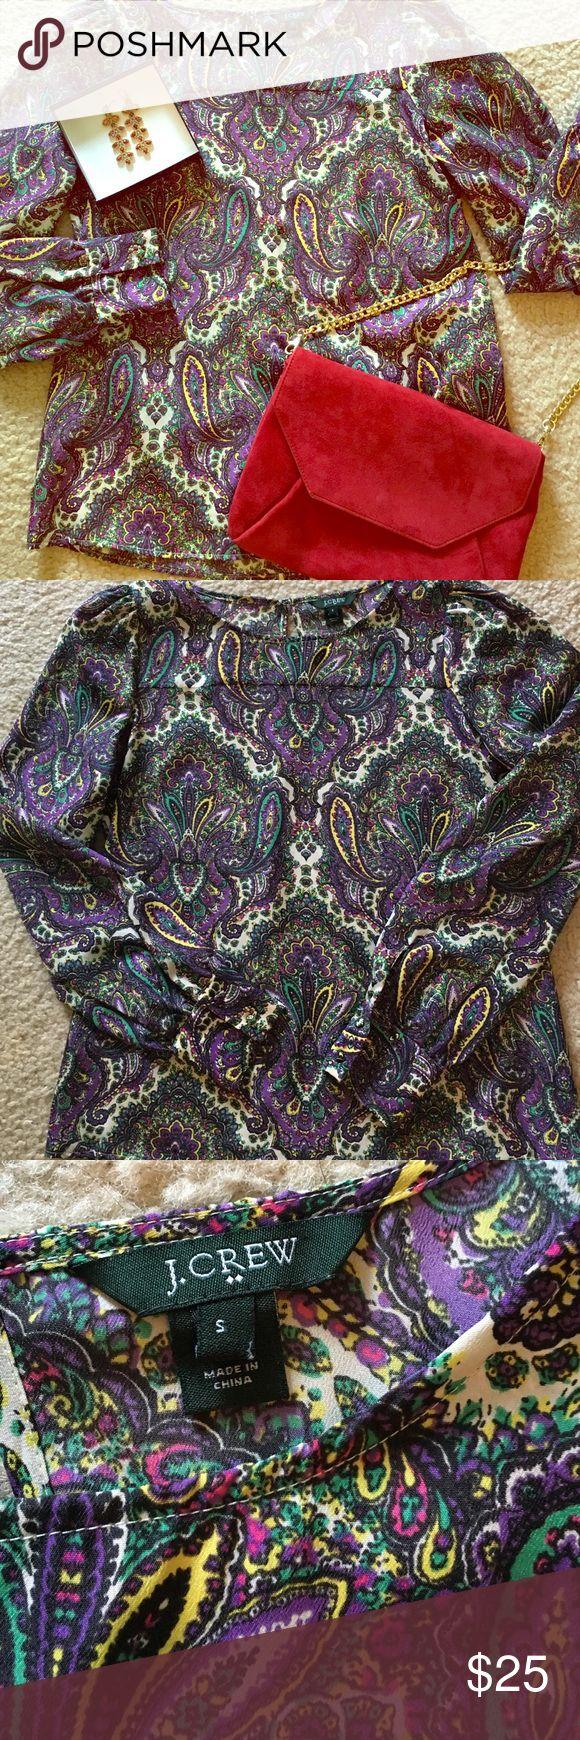 J Crew colorful paisley blouse! 💕 EUC J Crew paisley print blouse. Only worn a few times!!! J. Crew Tops Blouses